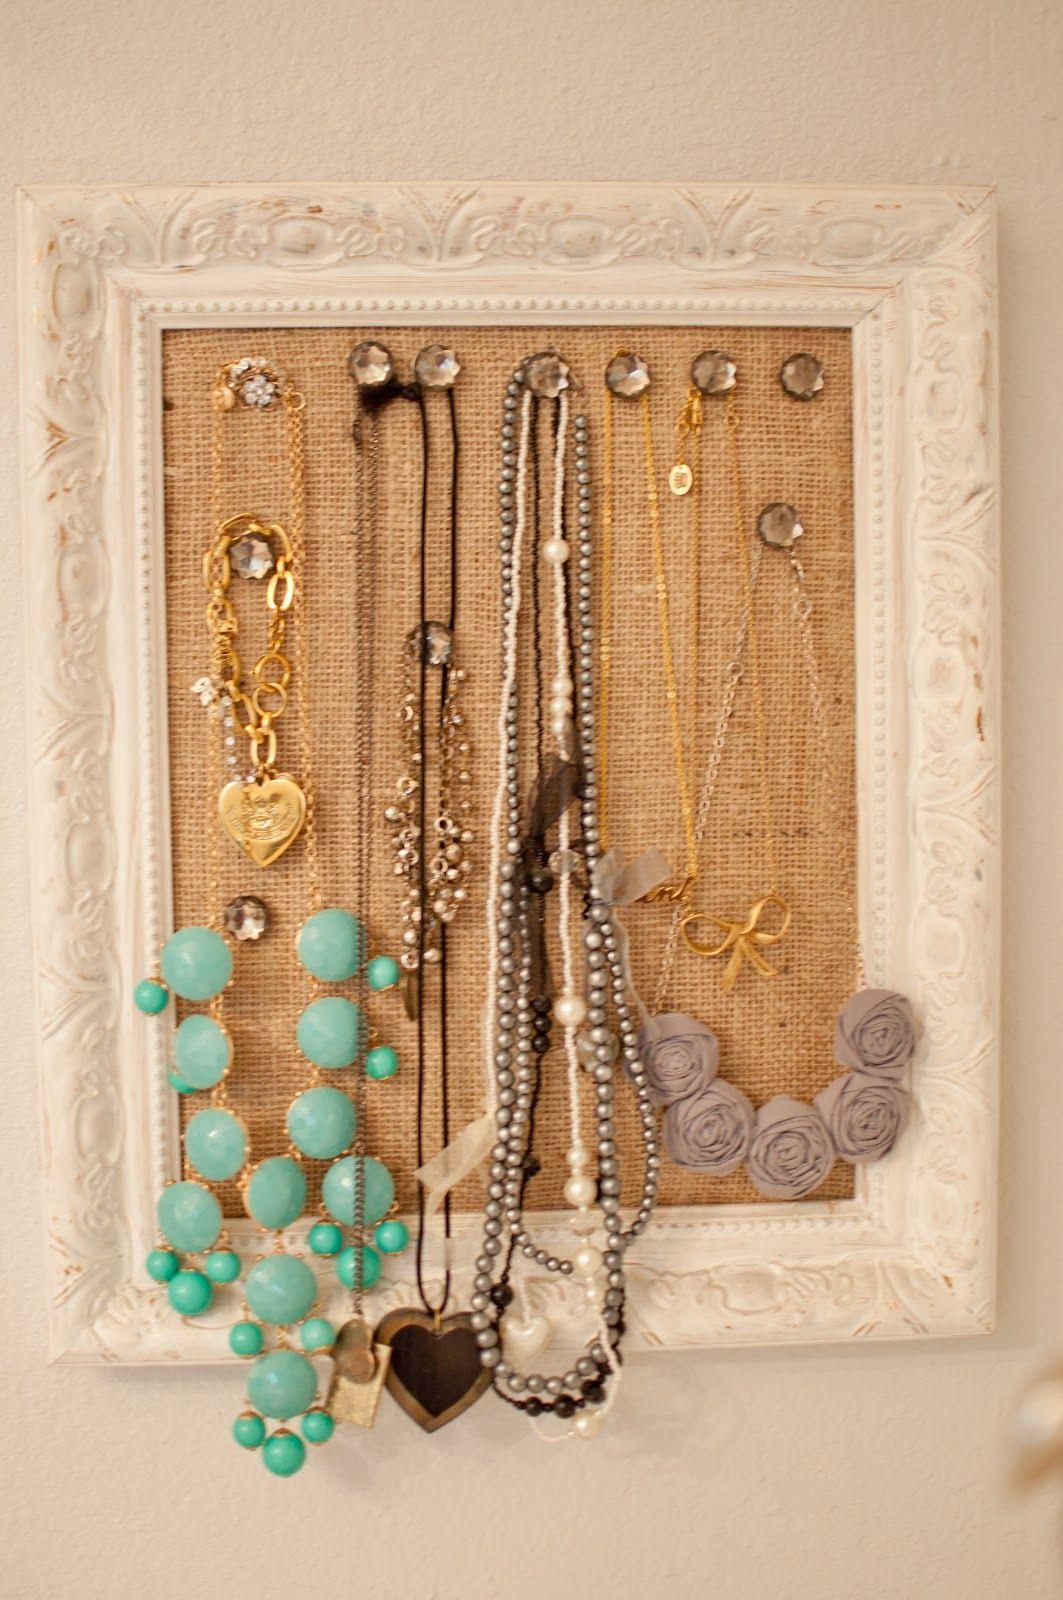 DIY Cork Board Jewelry Frame | Kettenhalter | Pinterest ...